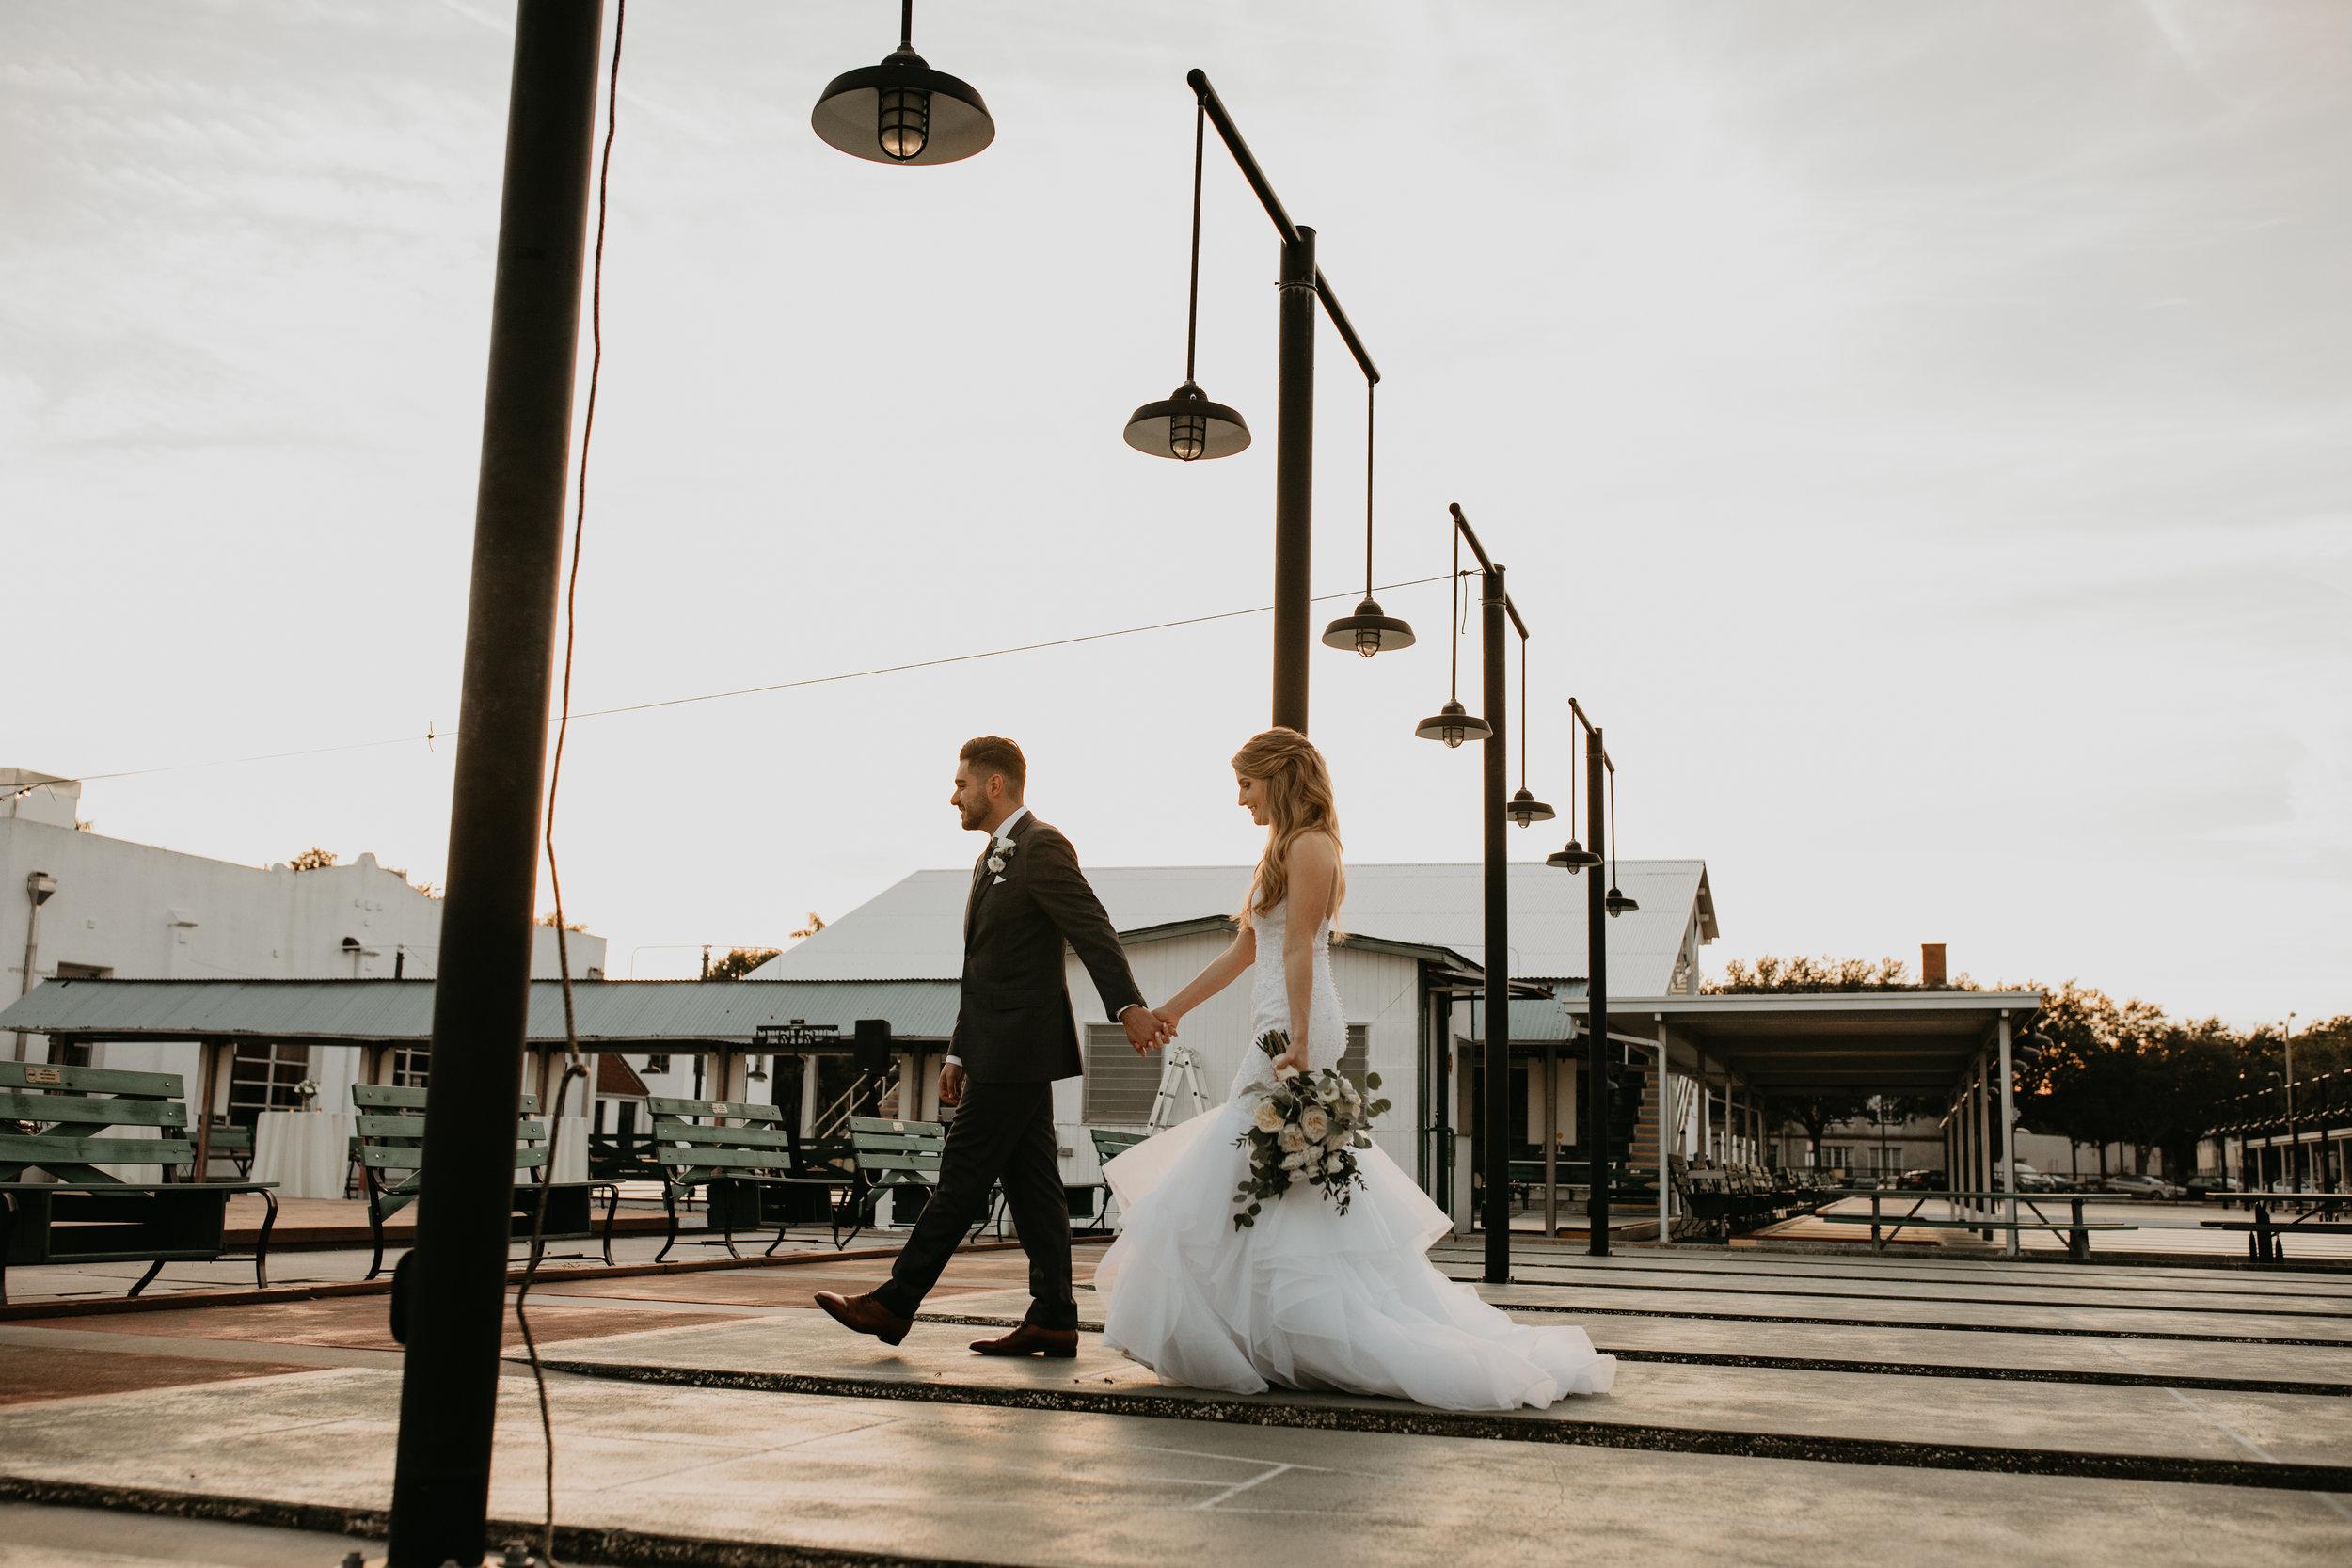 St Petersburg Shuffleboard Club St Petersburg Florida-Wedding- Rachel and Michael97.JPG